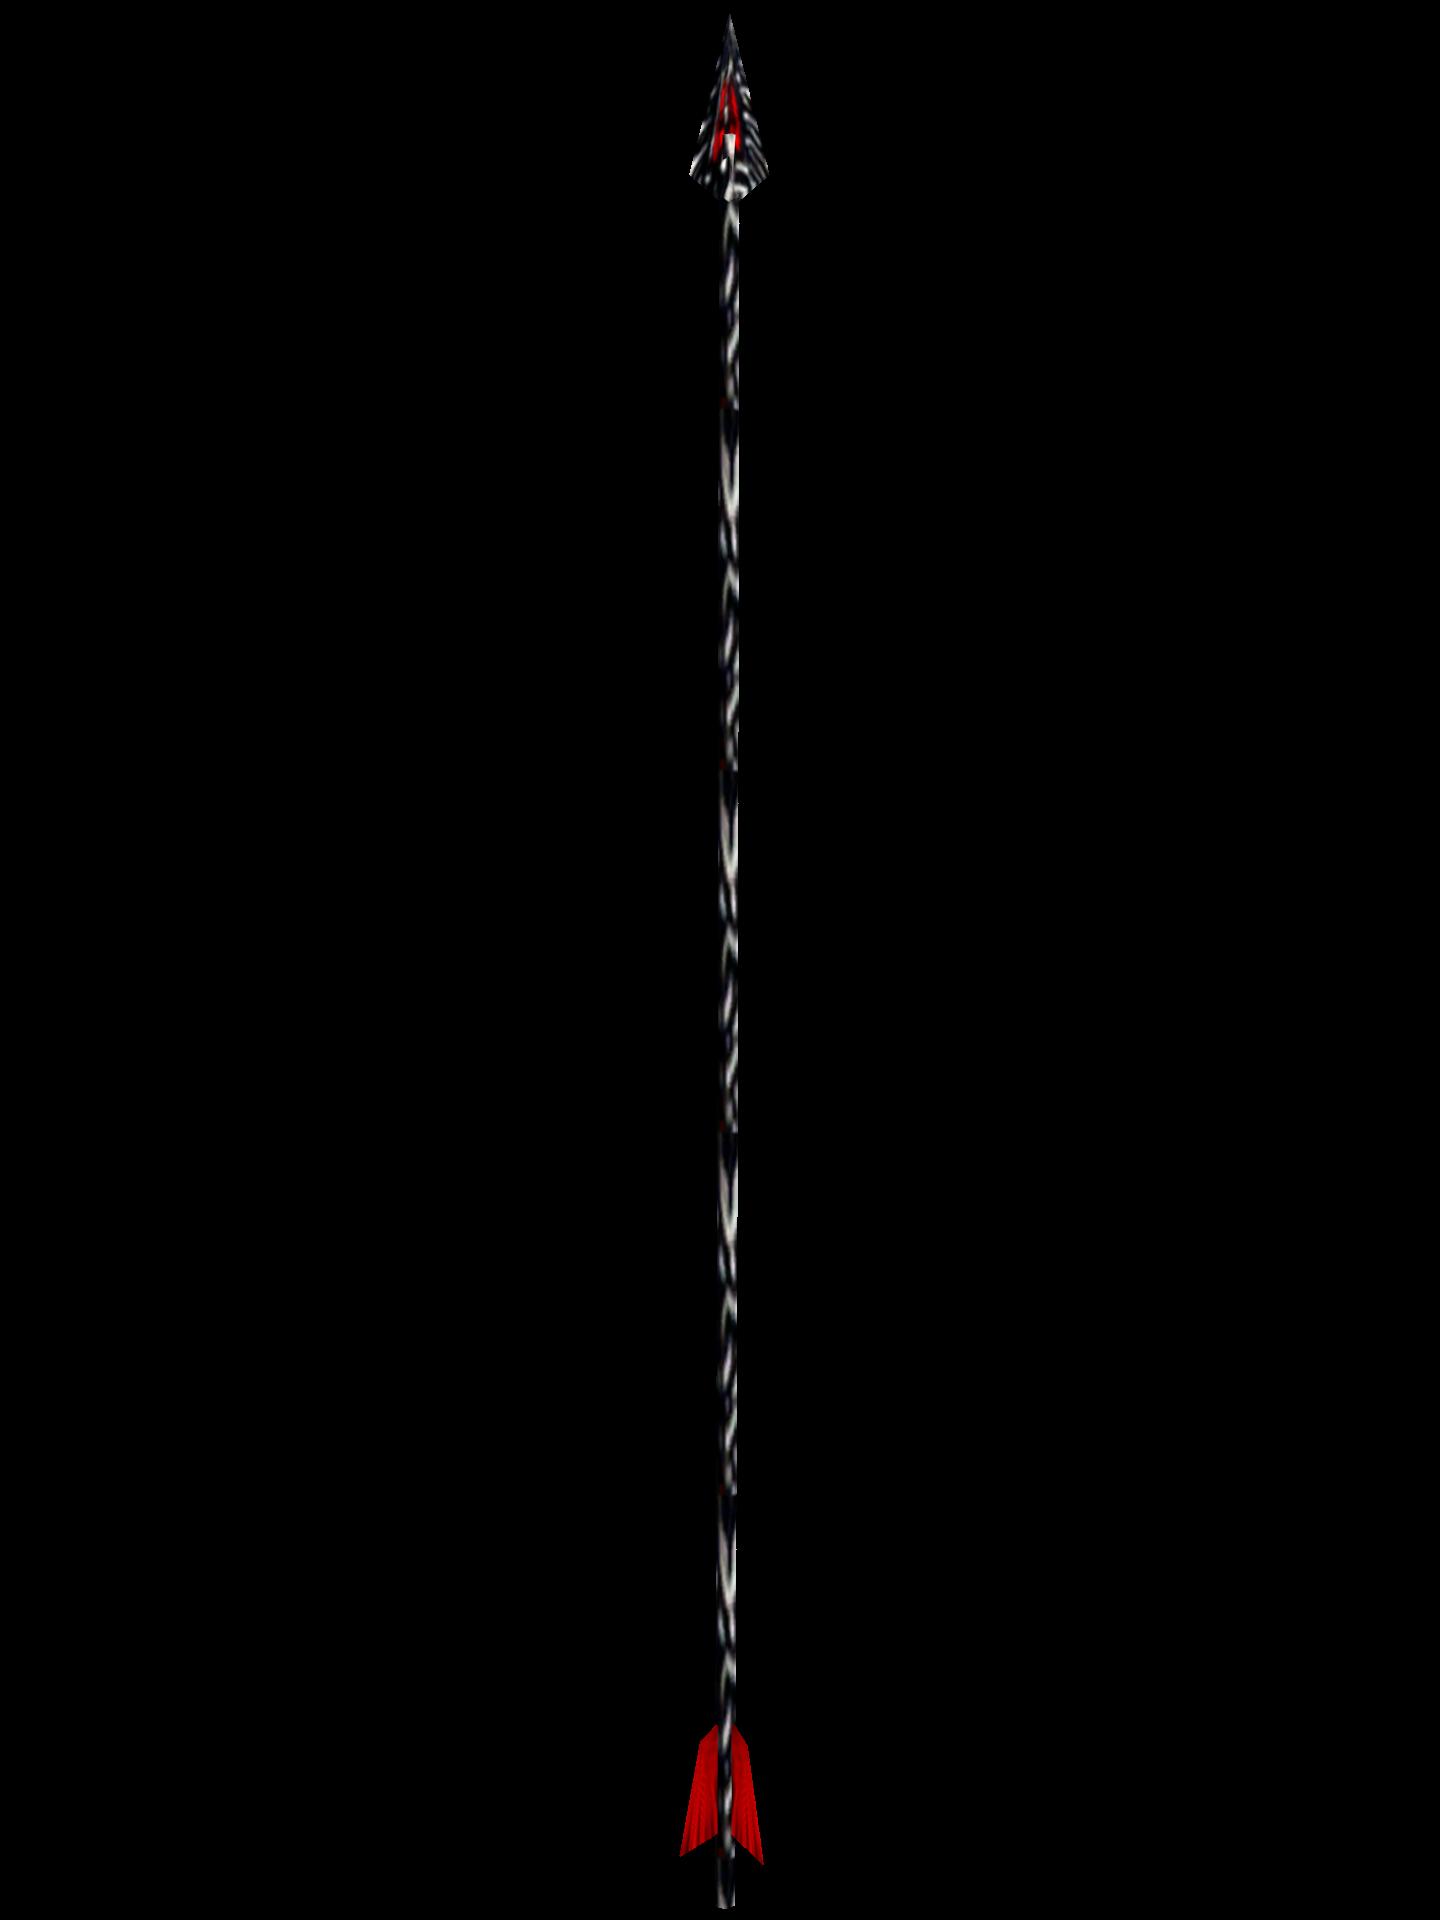 Daedric Arrow (Morrowind) | Elder Scrolls | FANDOM powered